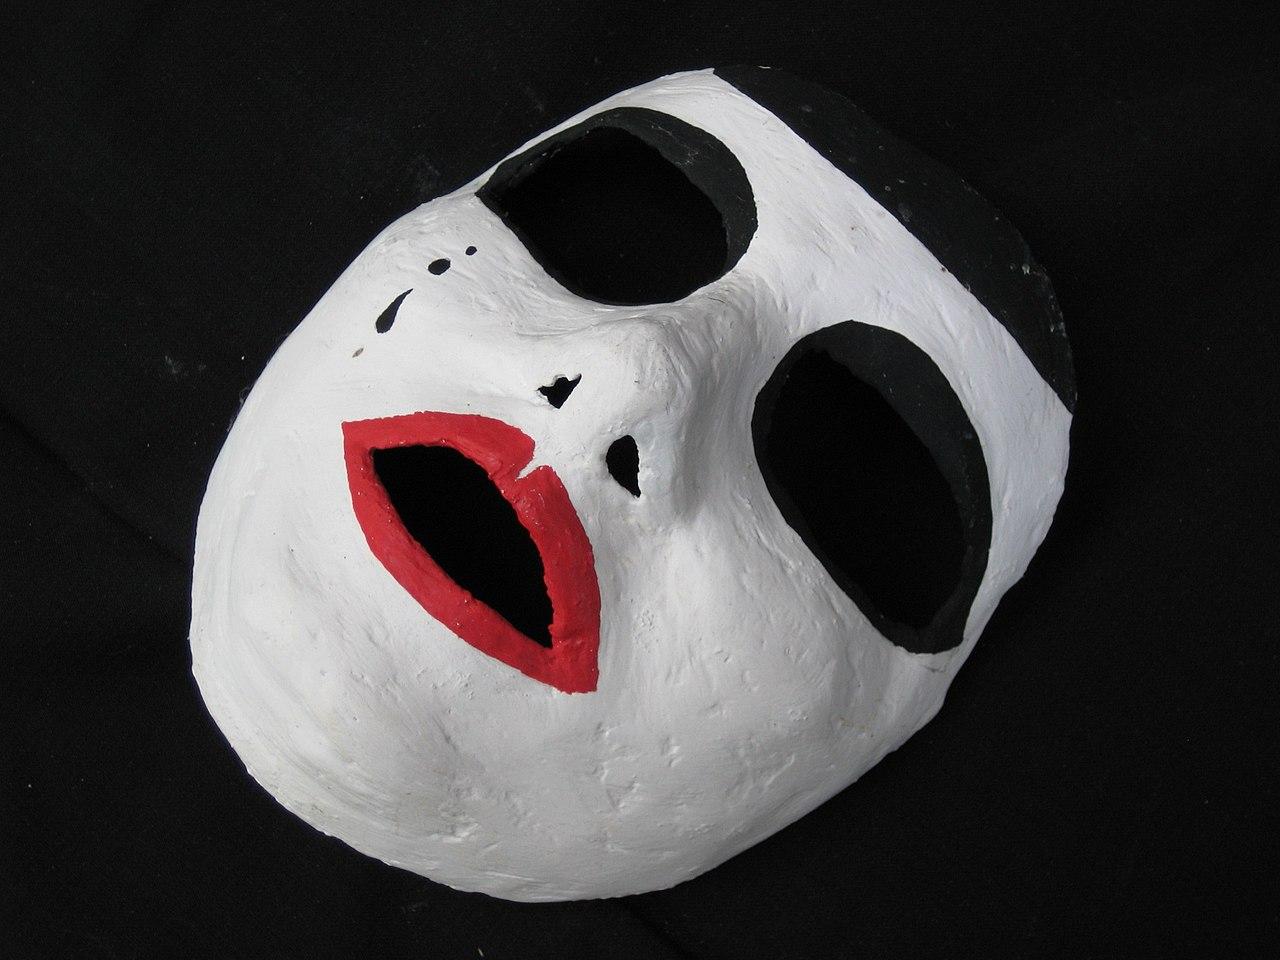 http://upload.wikimedia.org/wikipedia/de/thumb/1/11/Maske1766.JPG/1280px-Maske1766.JPG